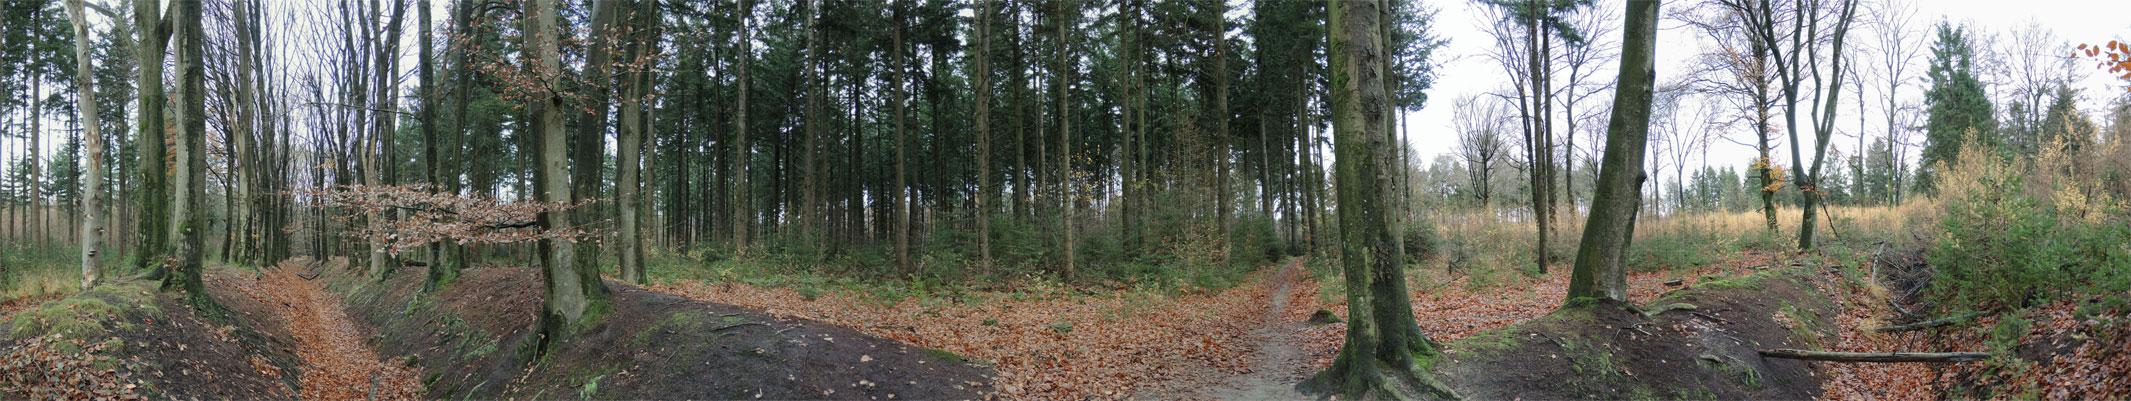 boswachterij-gees-rode-route-panorama-voetzoekers